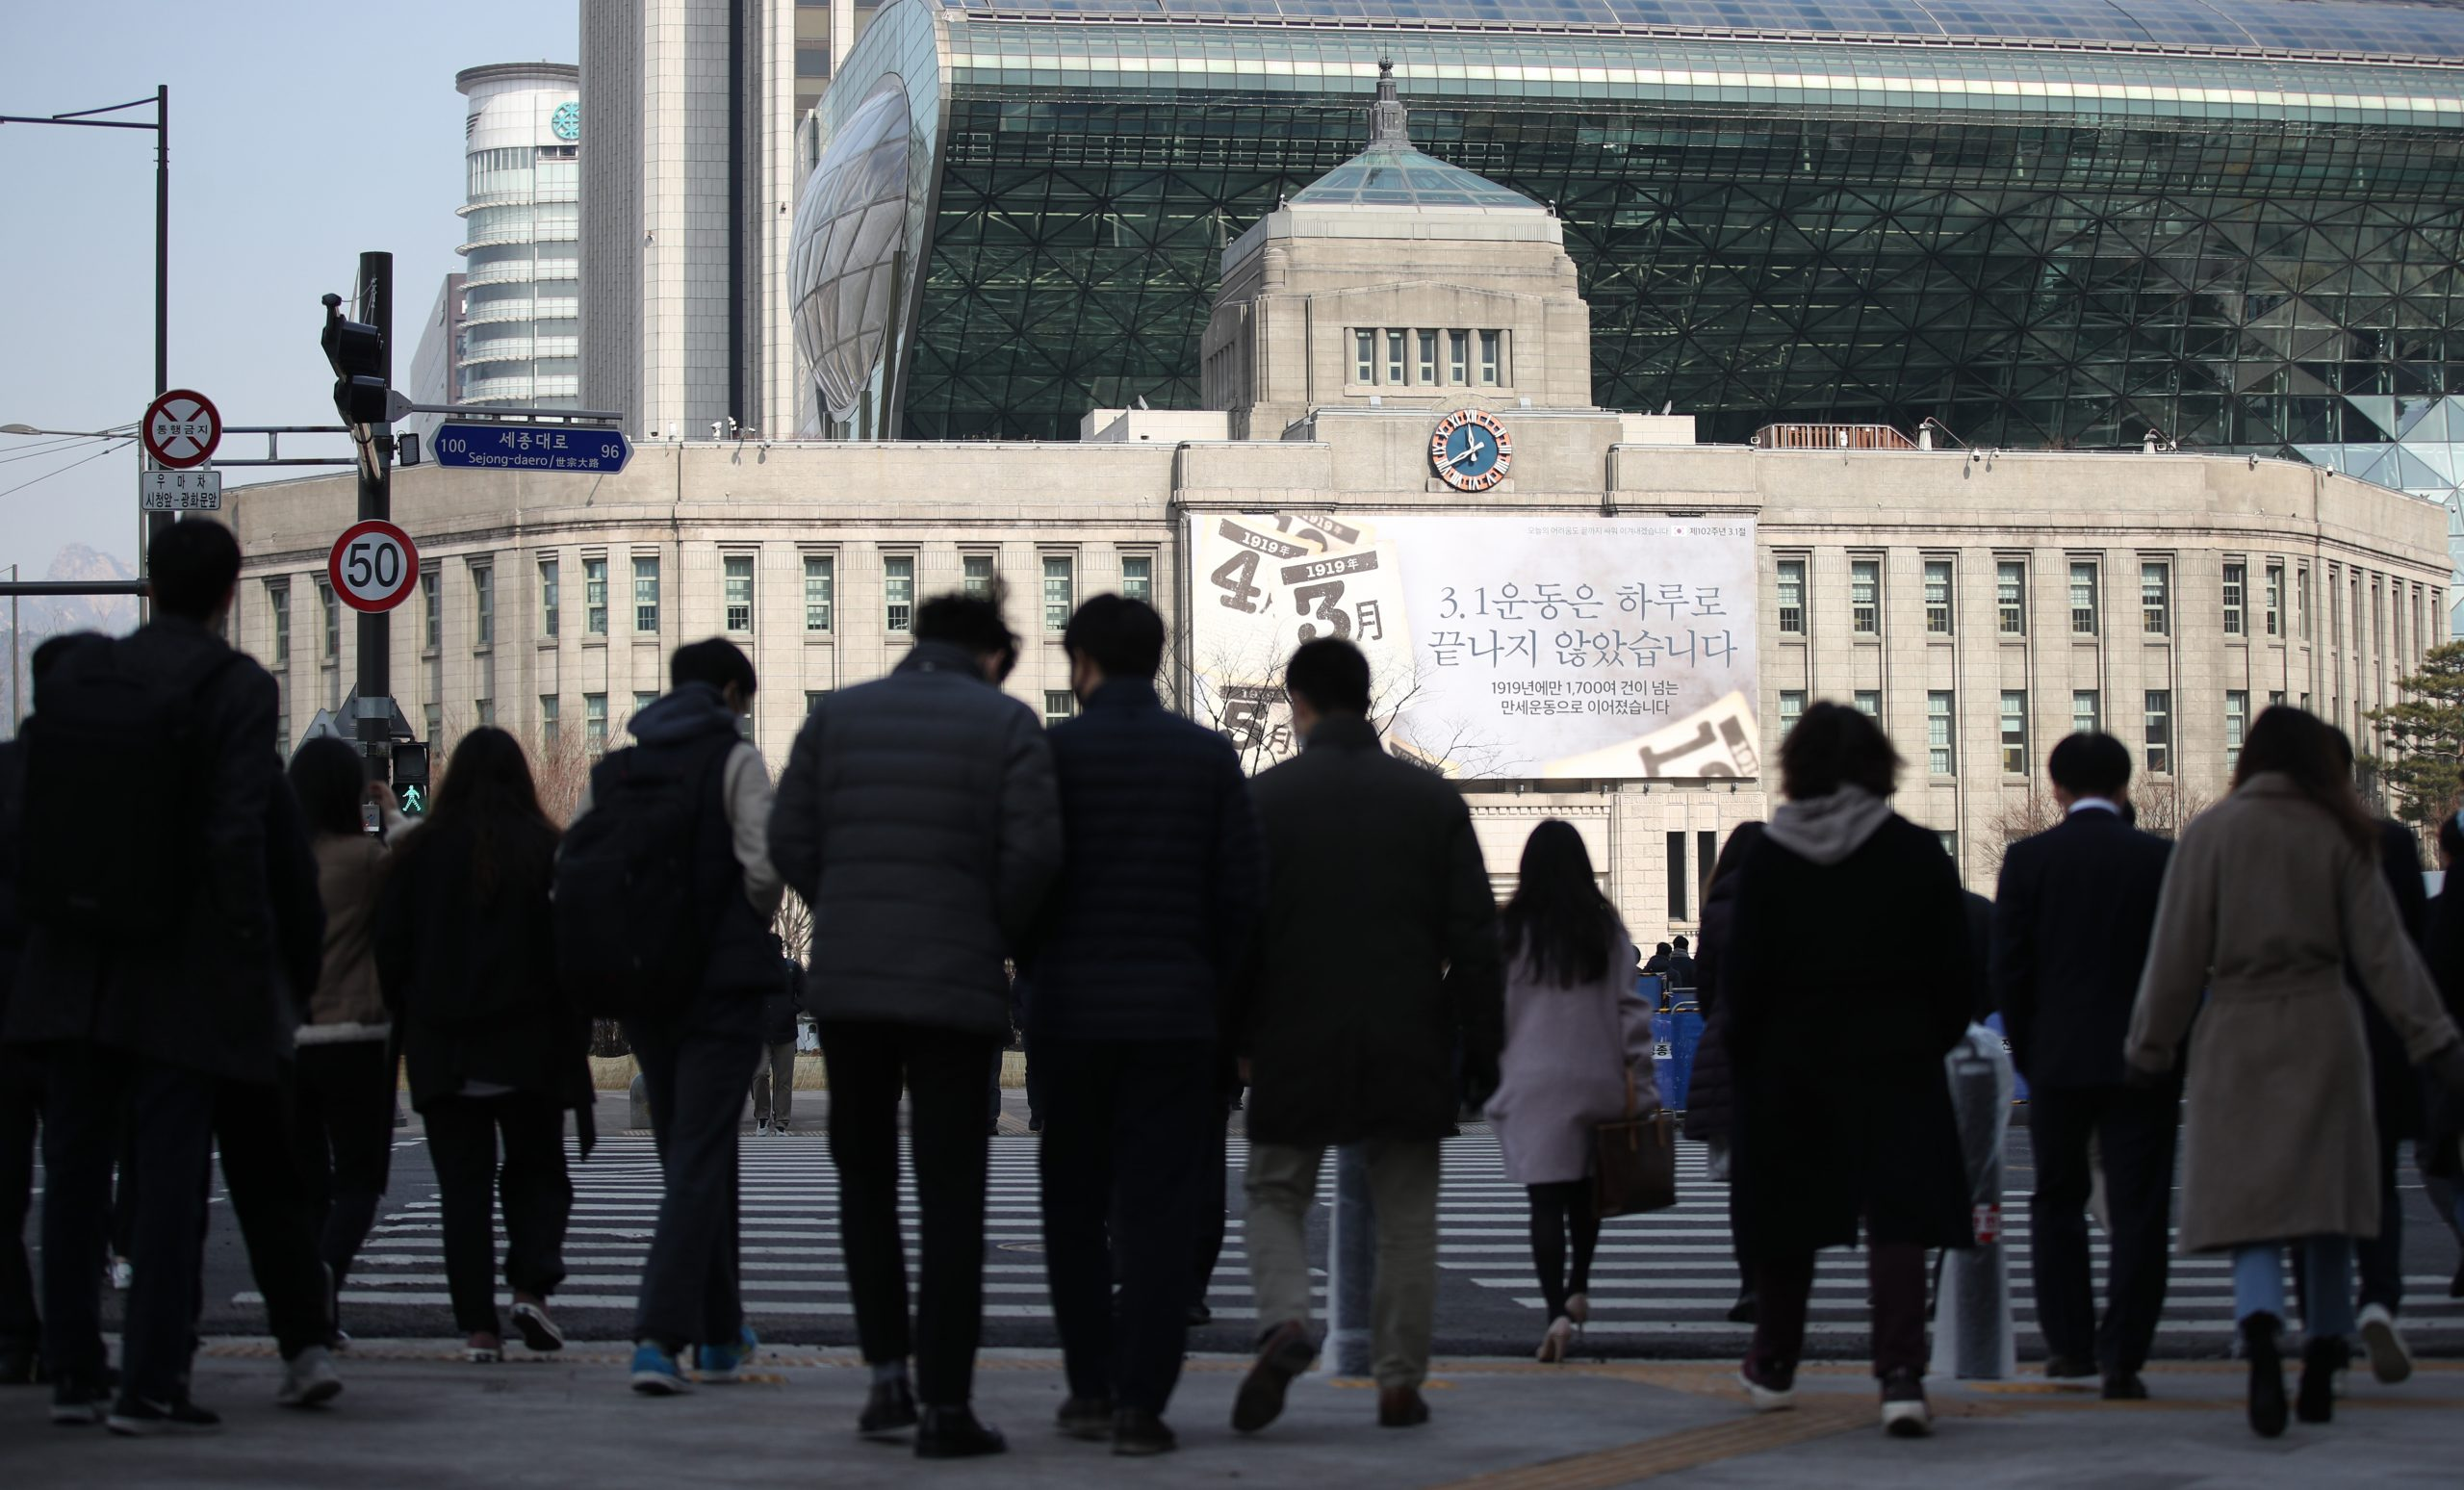 Seoul draws record US$10.2 bln in FDI in 2020 despite pandemic